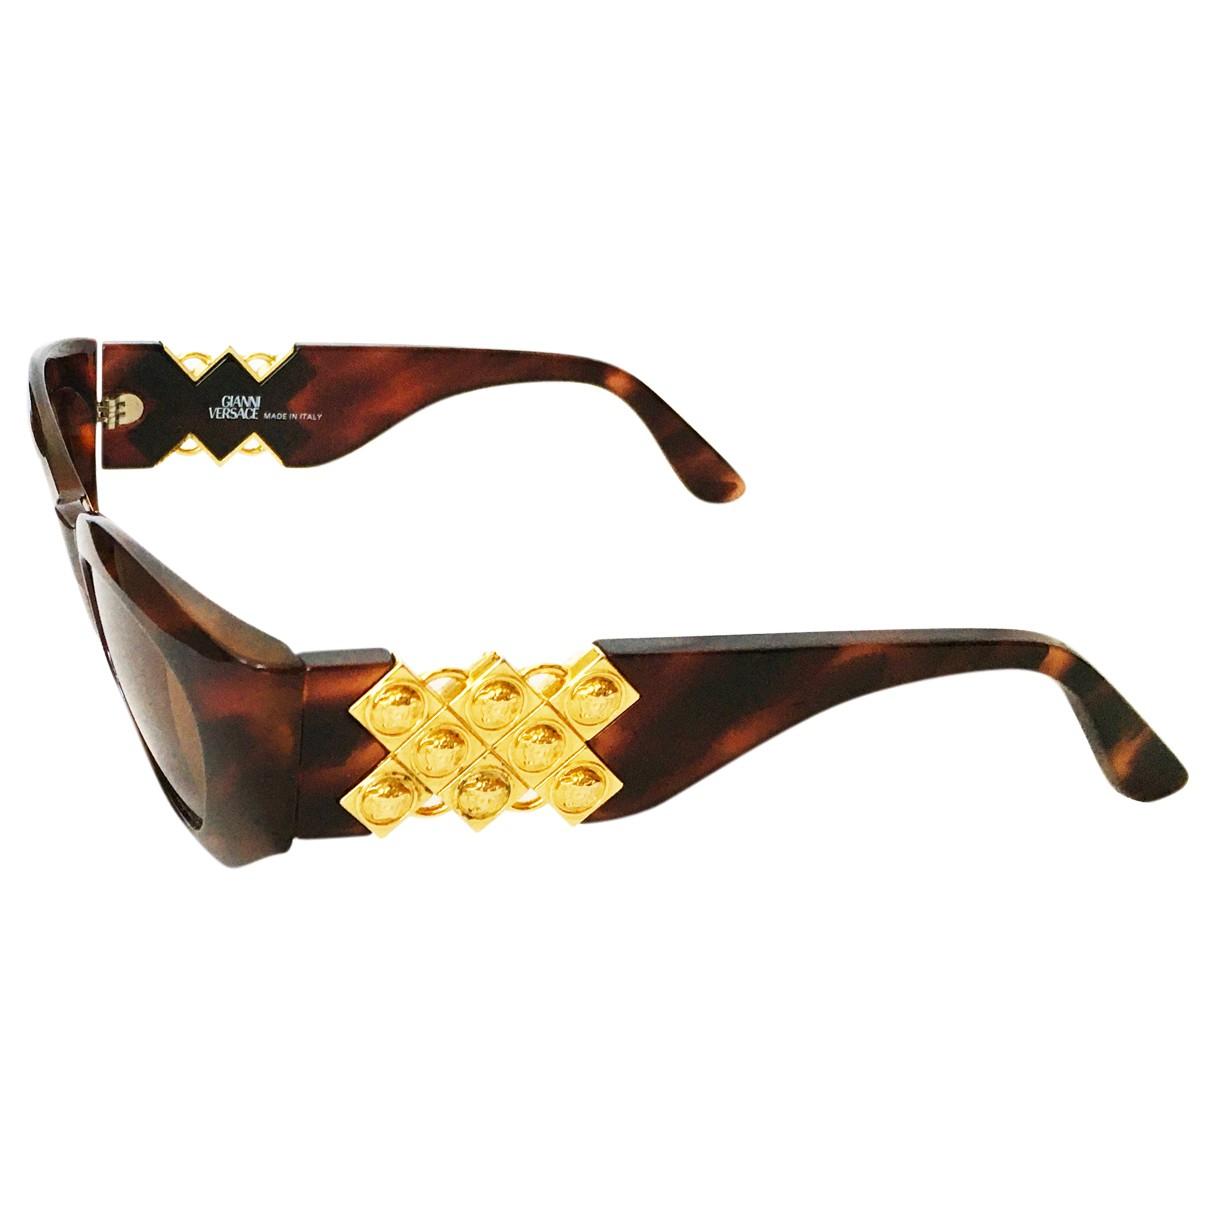 Gianni Versace N Brown Sunglasses for Women N